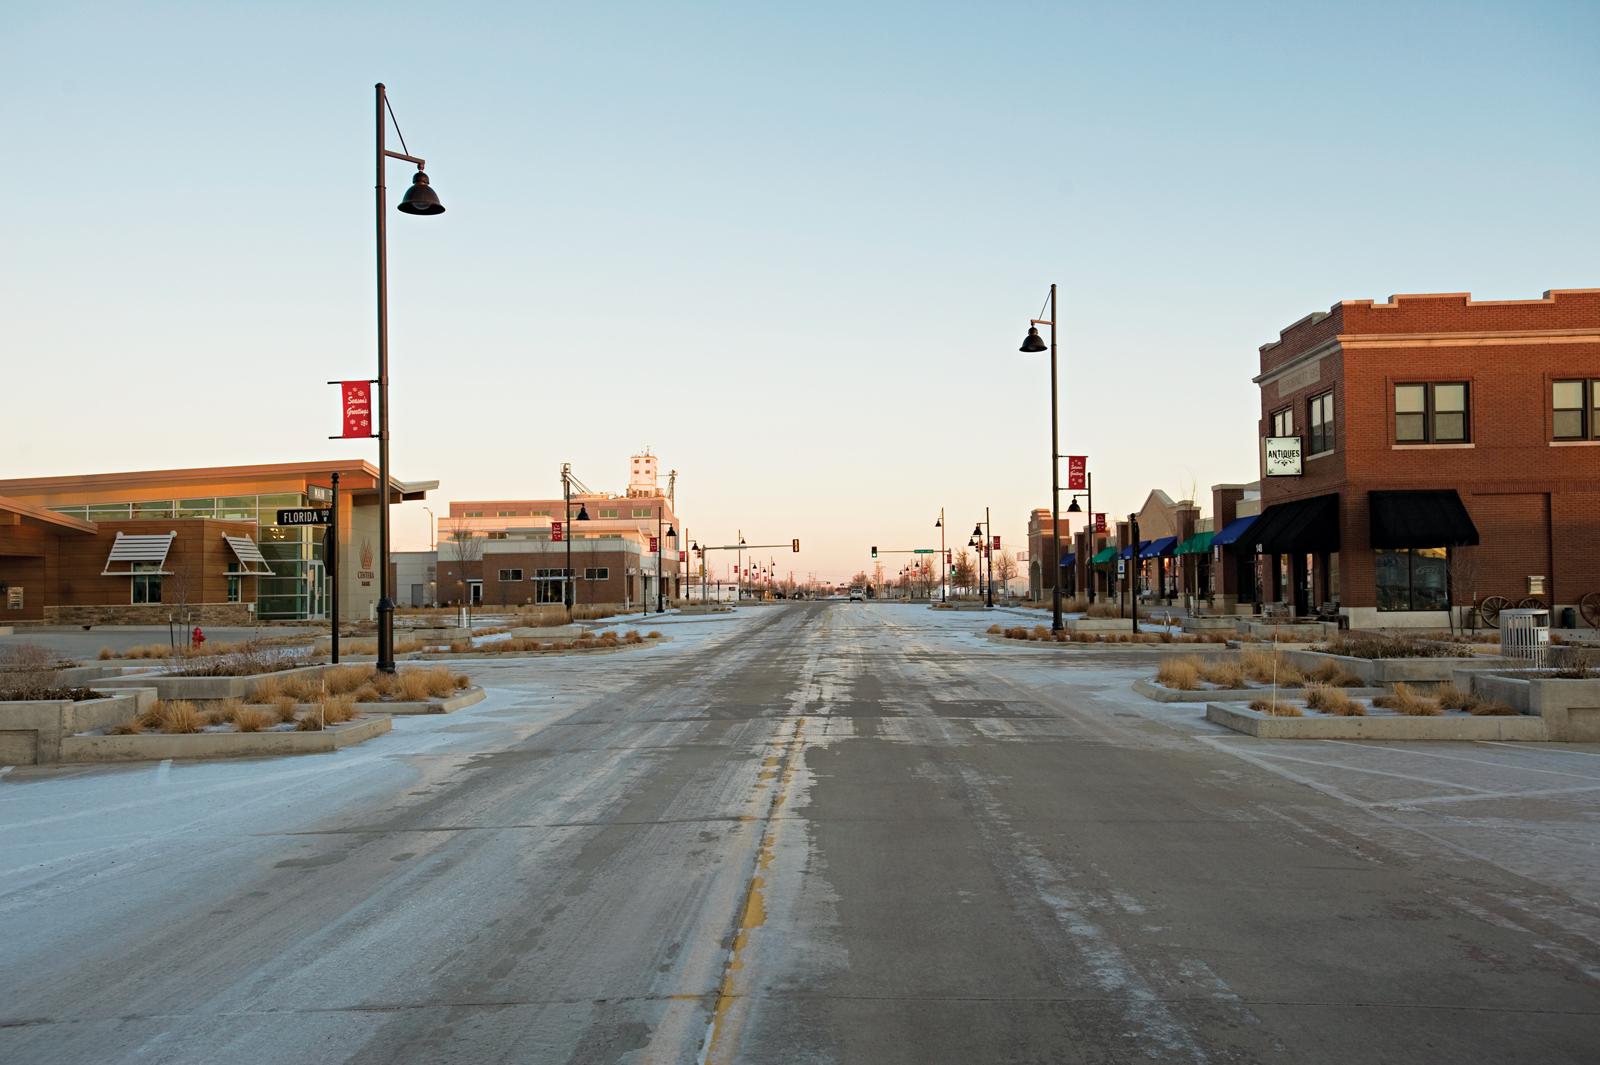 Main Street in Greensburg, Kansas